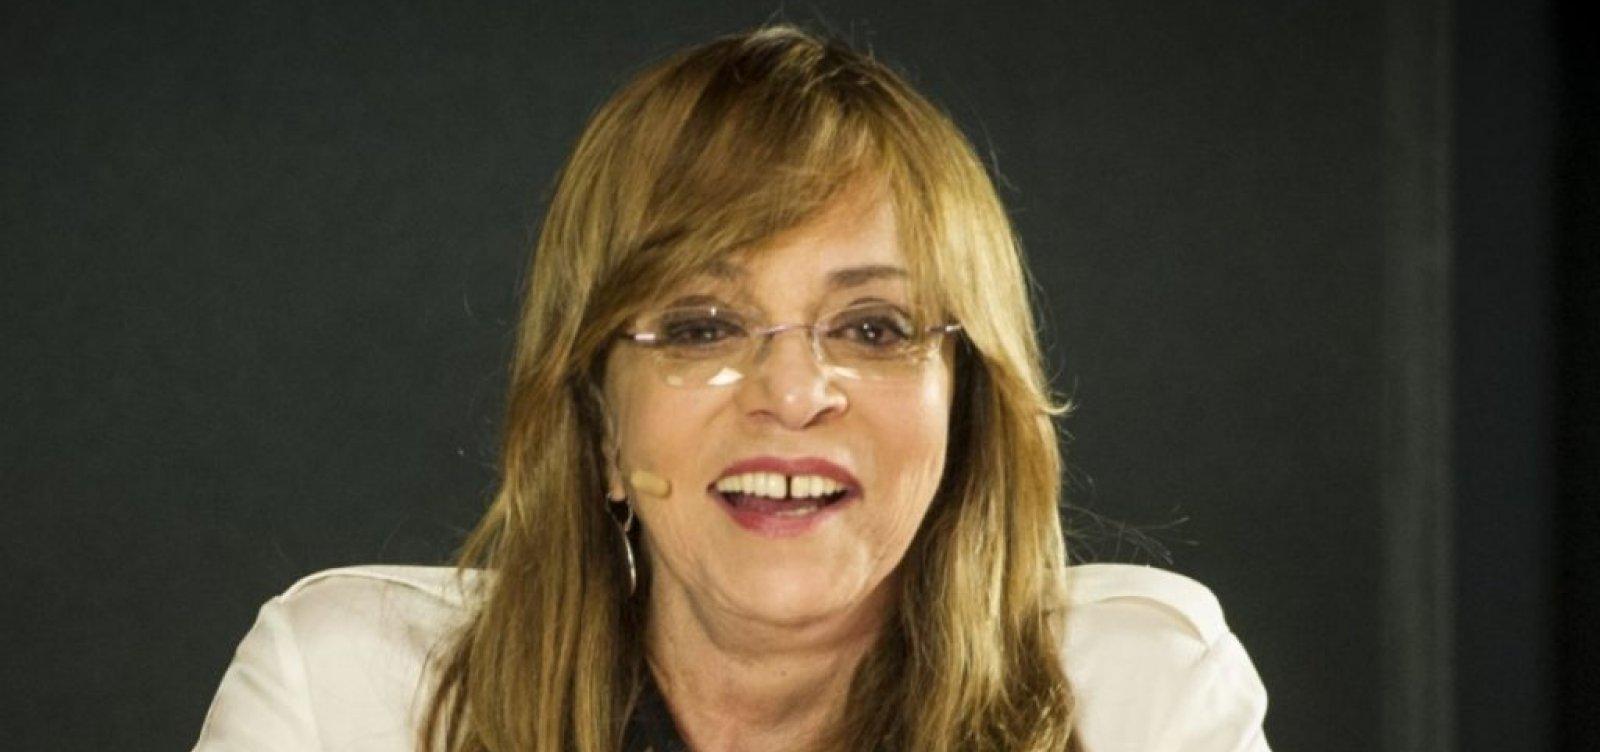 [José de Abreu ataca Glória Perez no Twitter; ator se arrepende e pede desculpas]